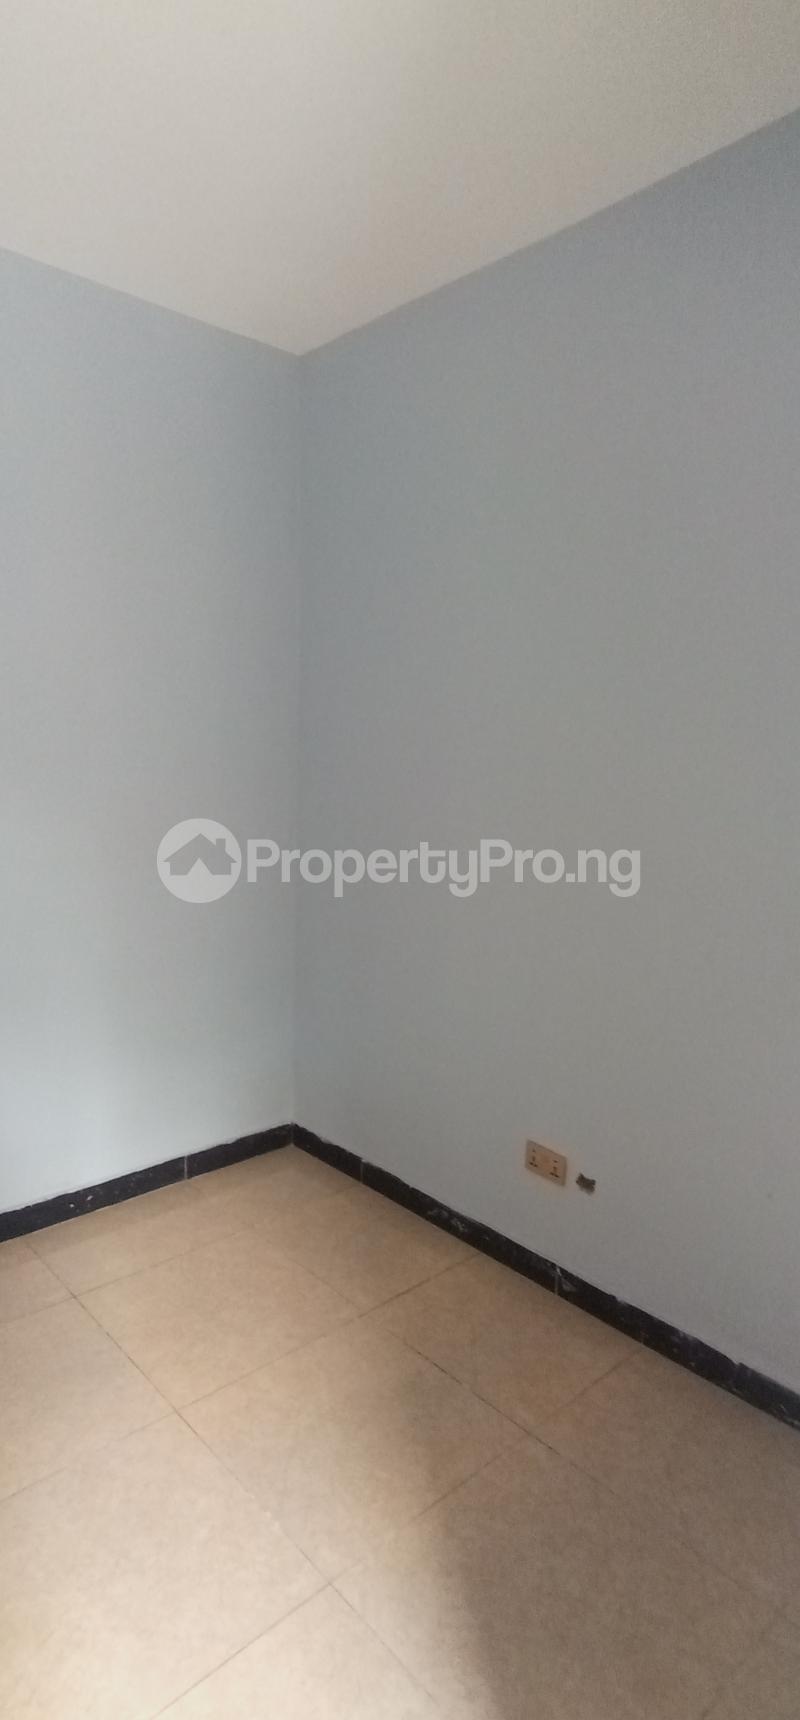 4 bedroom Terraced Duplex House for sale Wuye Abuja - 14